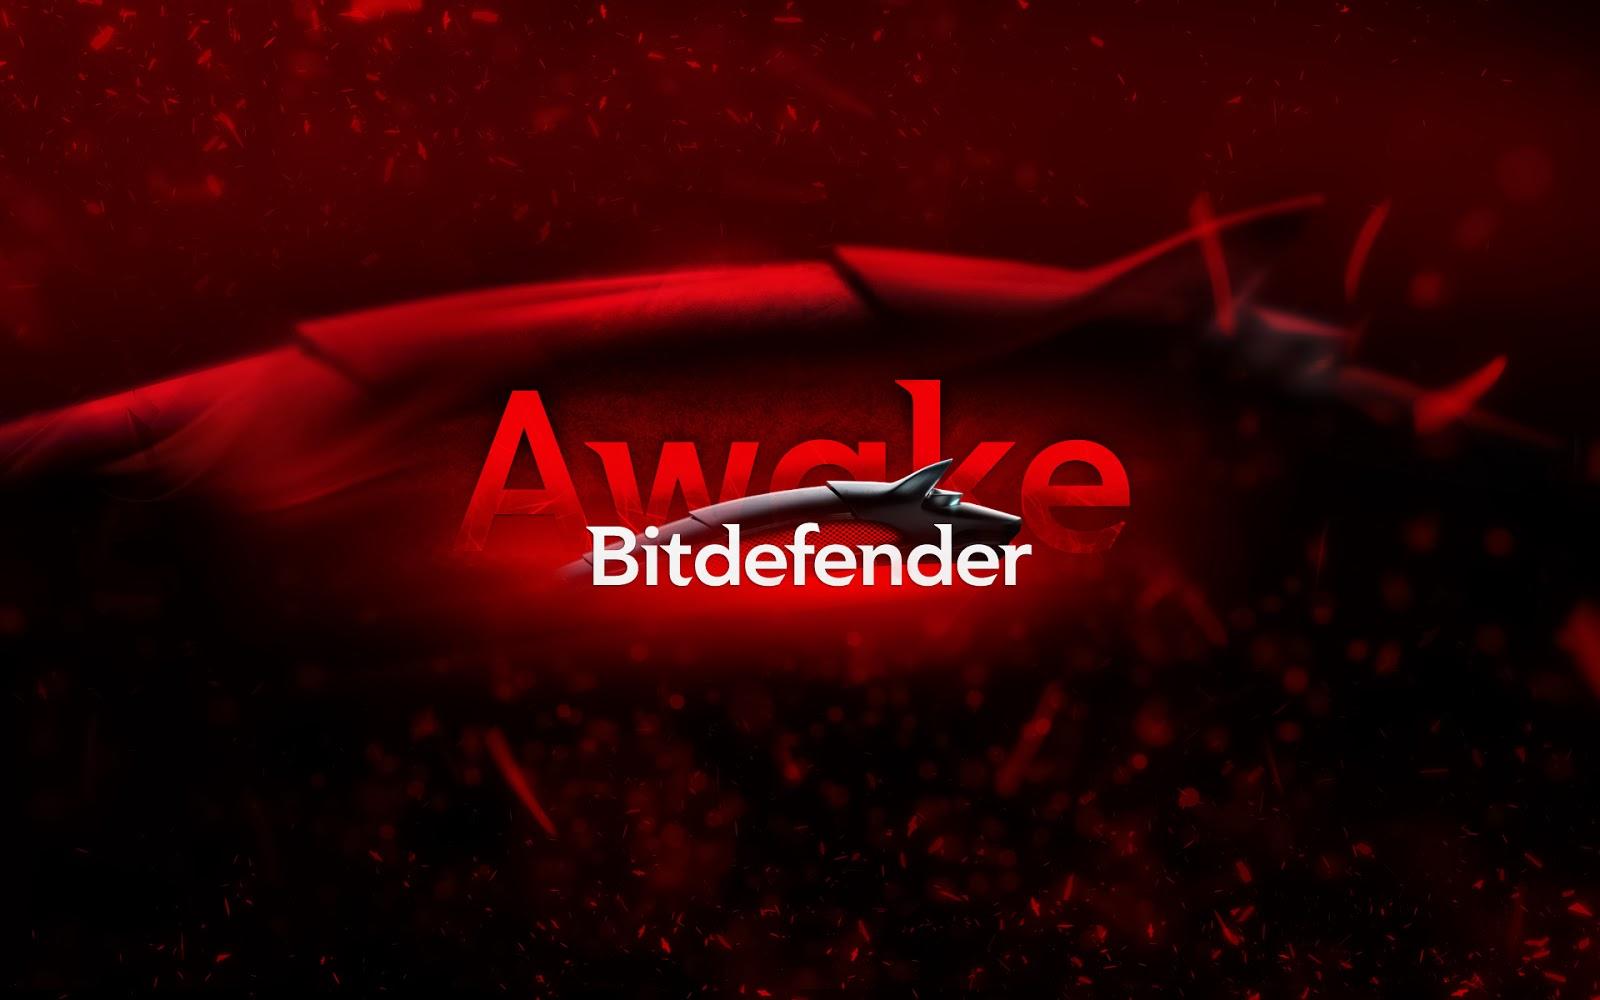 Bitdefender Wallpapers 4USkYcom 1600x1000